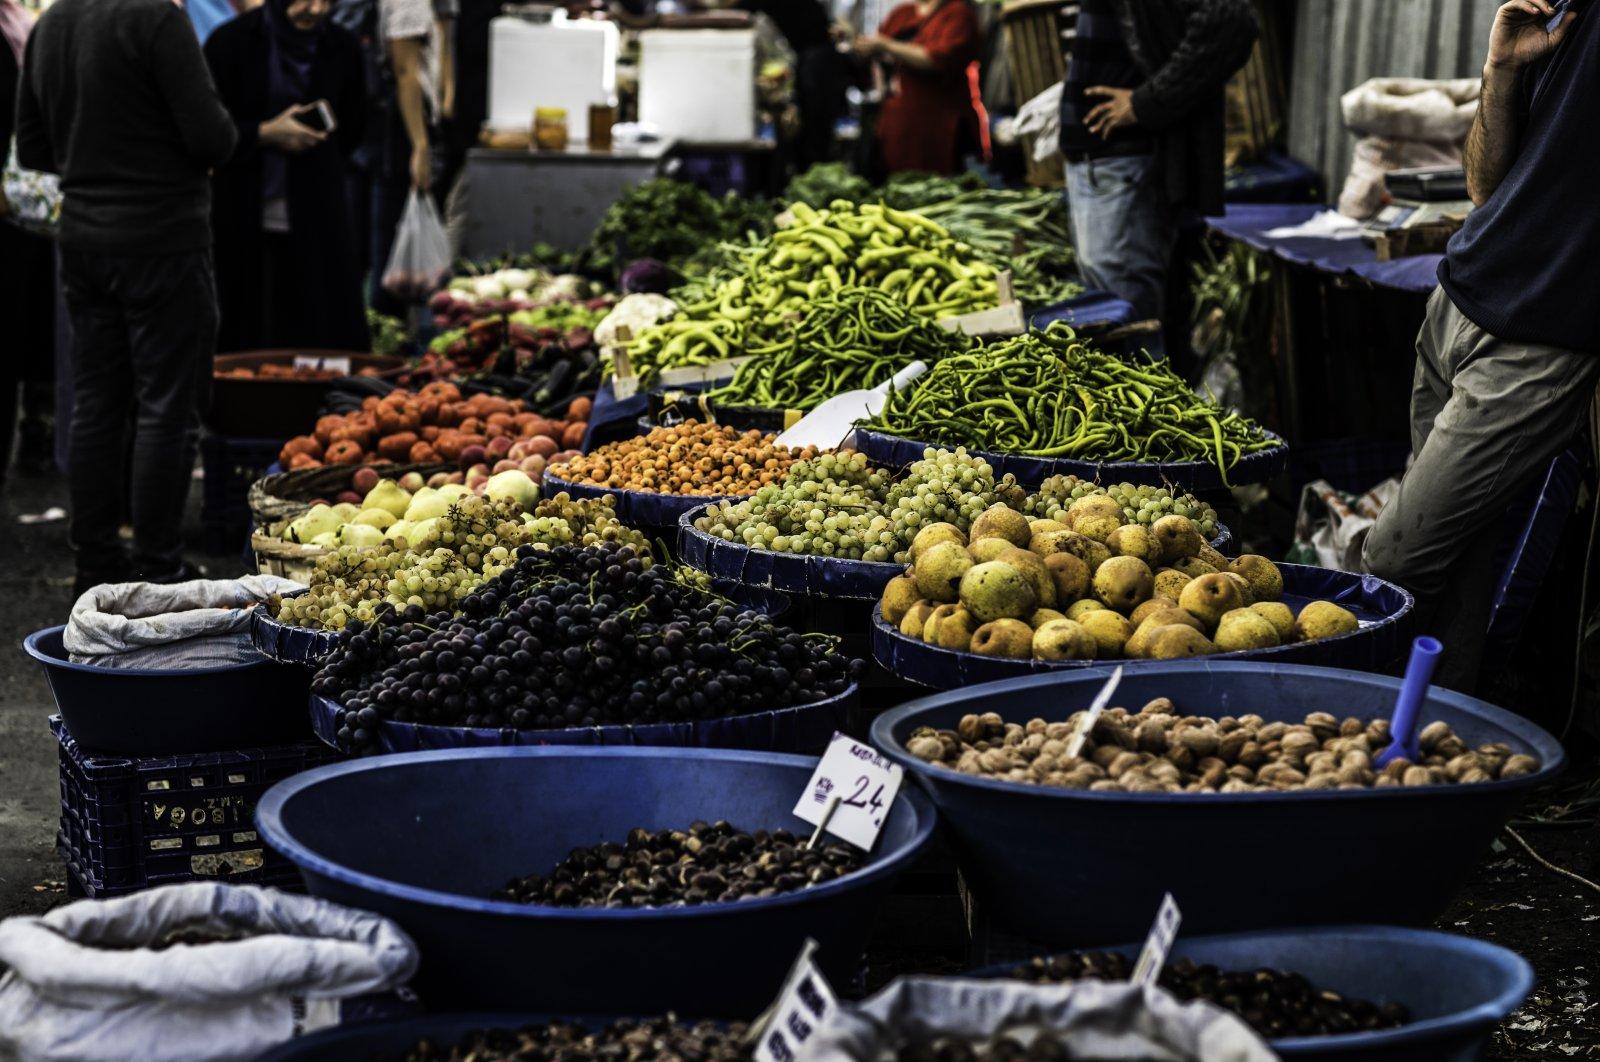 A vendor sells vegetables in the organic market in Kasımpaşa, Istanbul, Turkey, Oct. 13, 2019. (Getty Images)